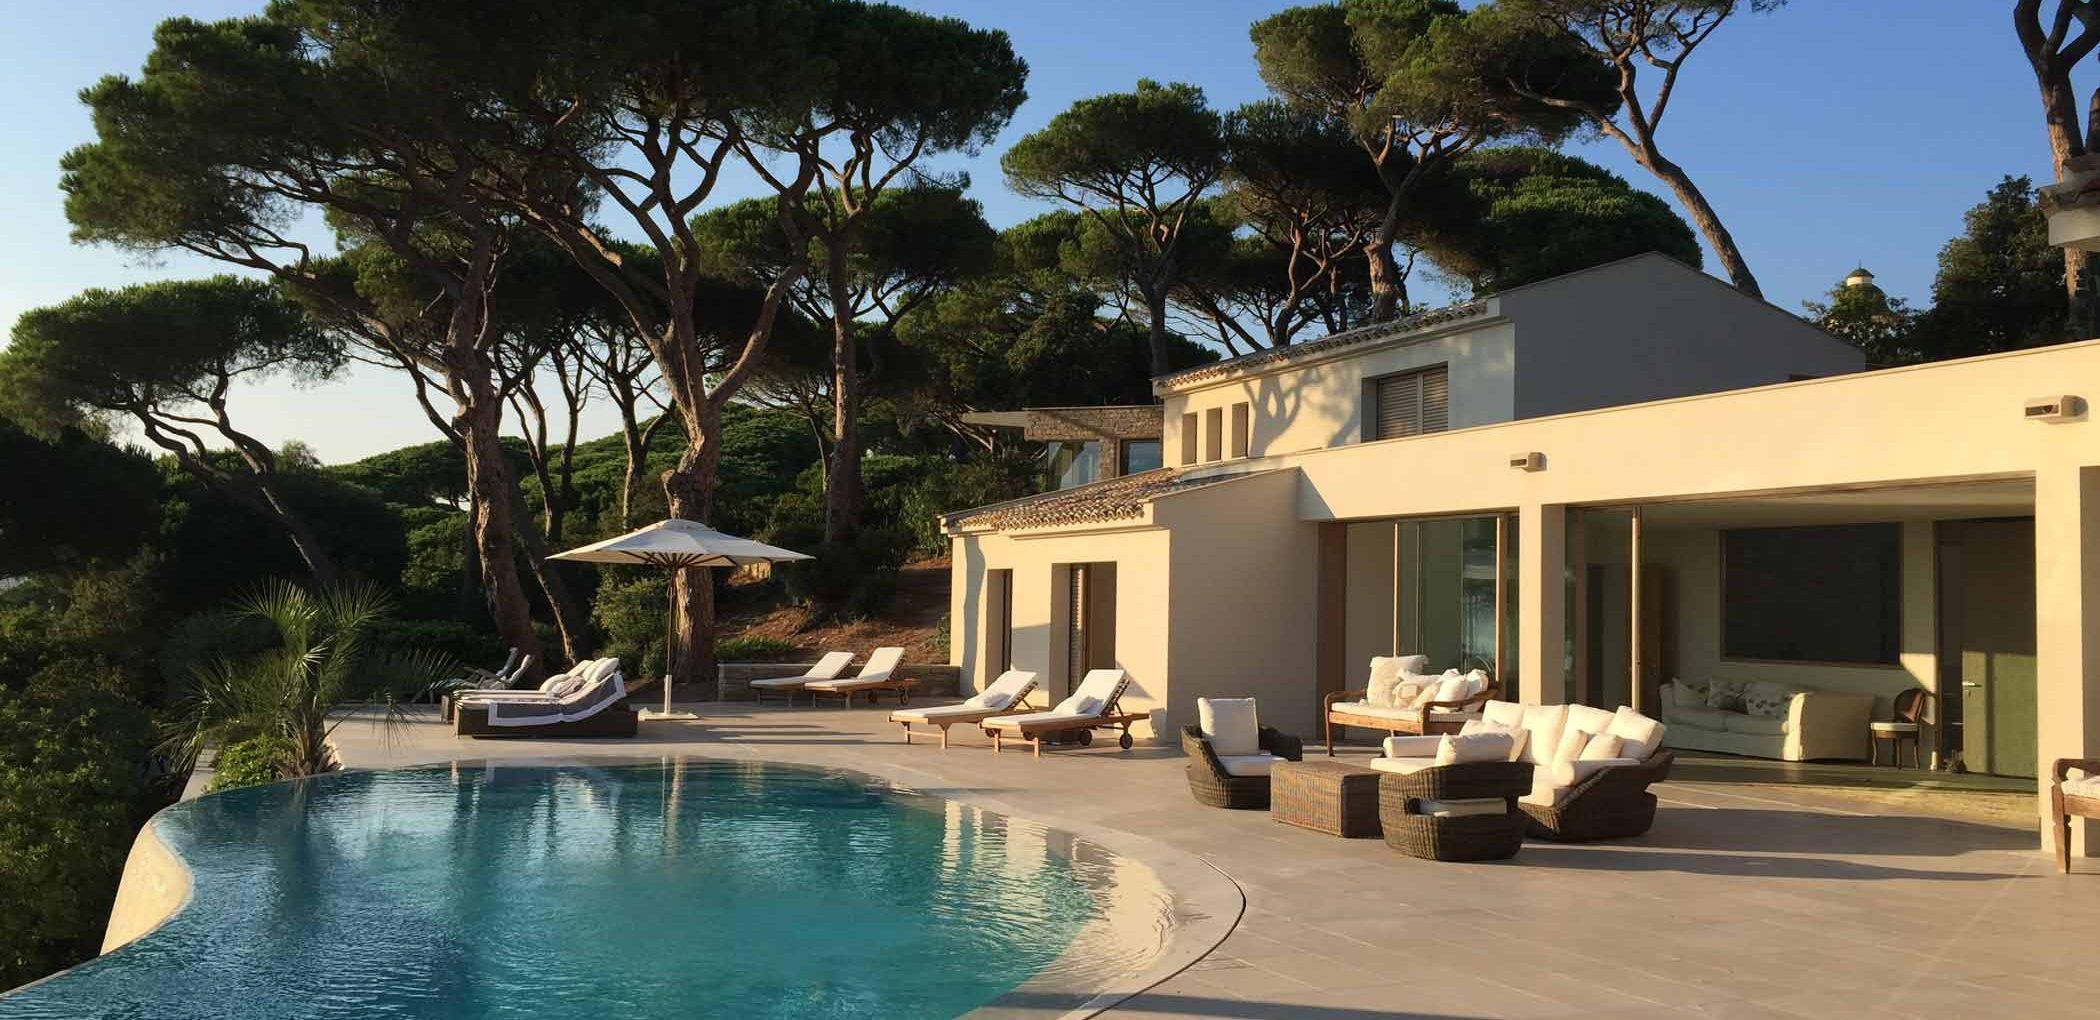 View of Villa Saint Tropez with wooden lift and slide doors Skyline Sliding